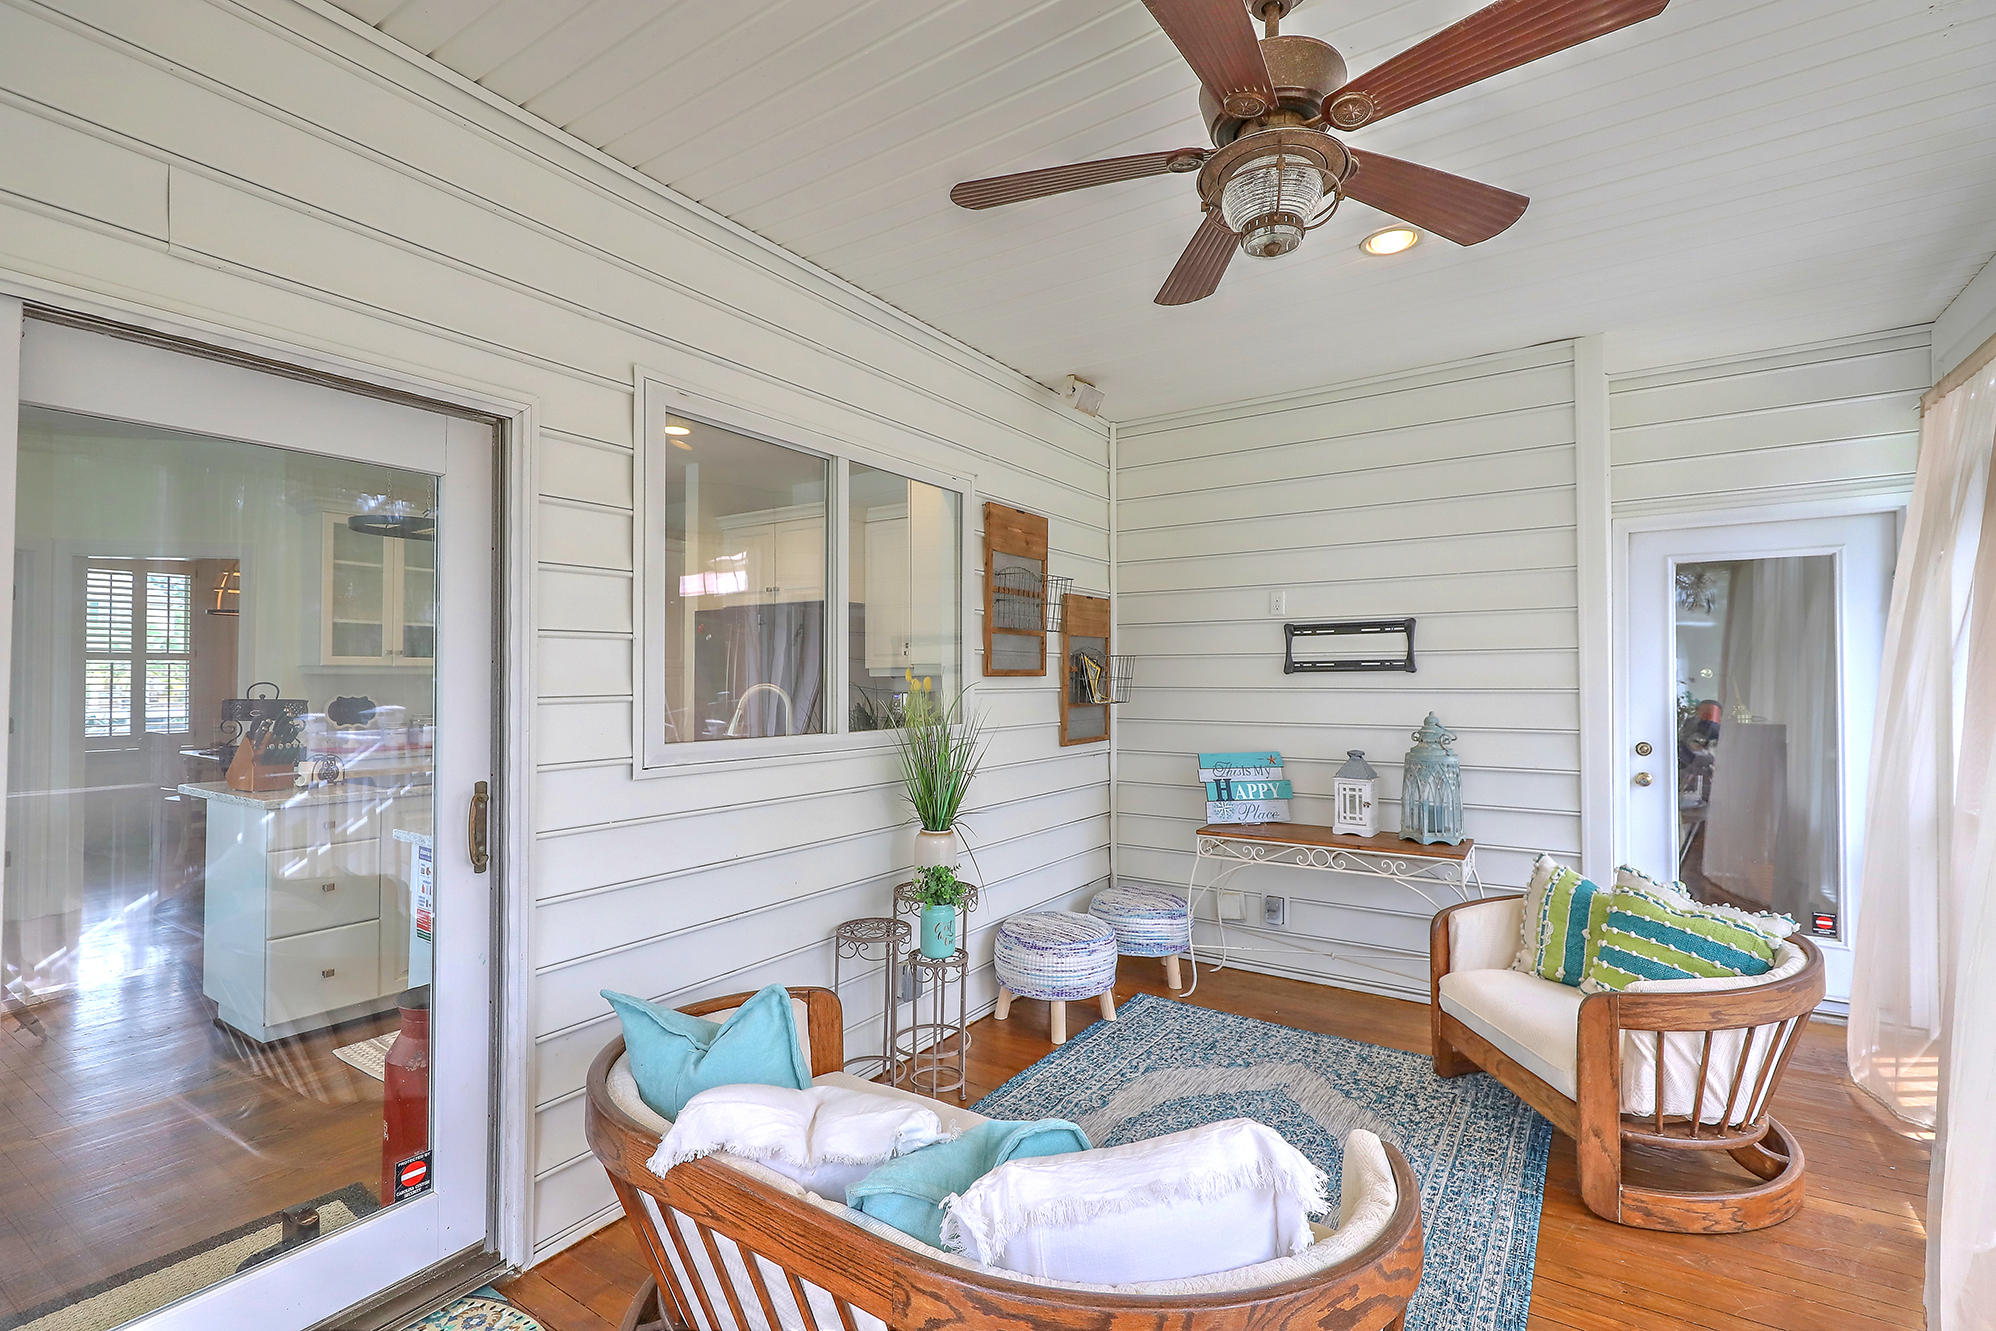 Horlbeck Creek Homes For Sale - 1339 River Otter, Mount Pleasant, SC - 11